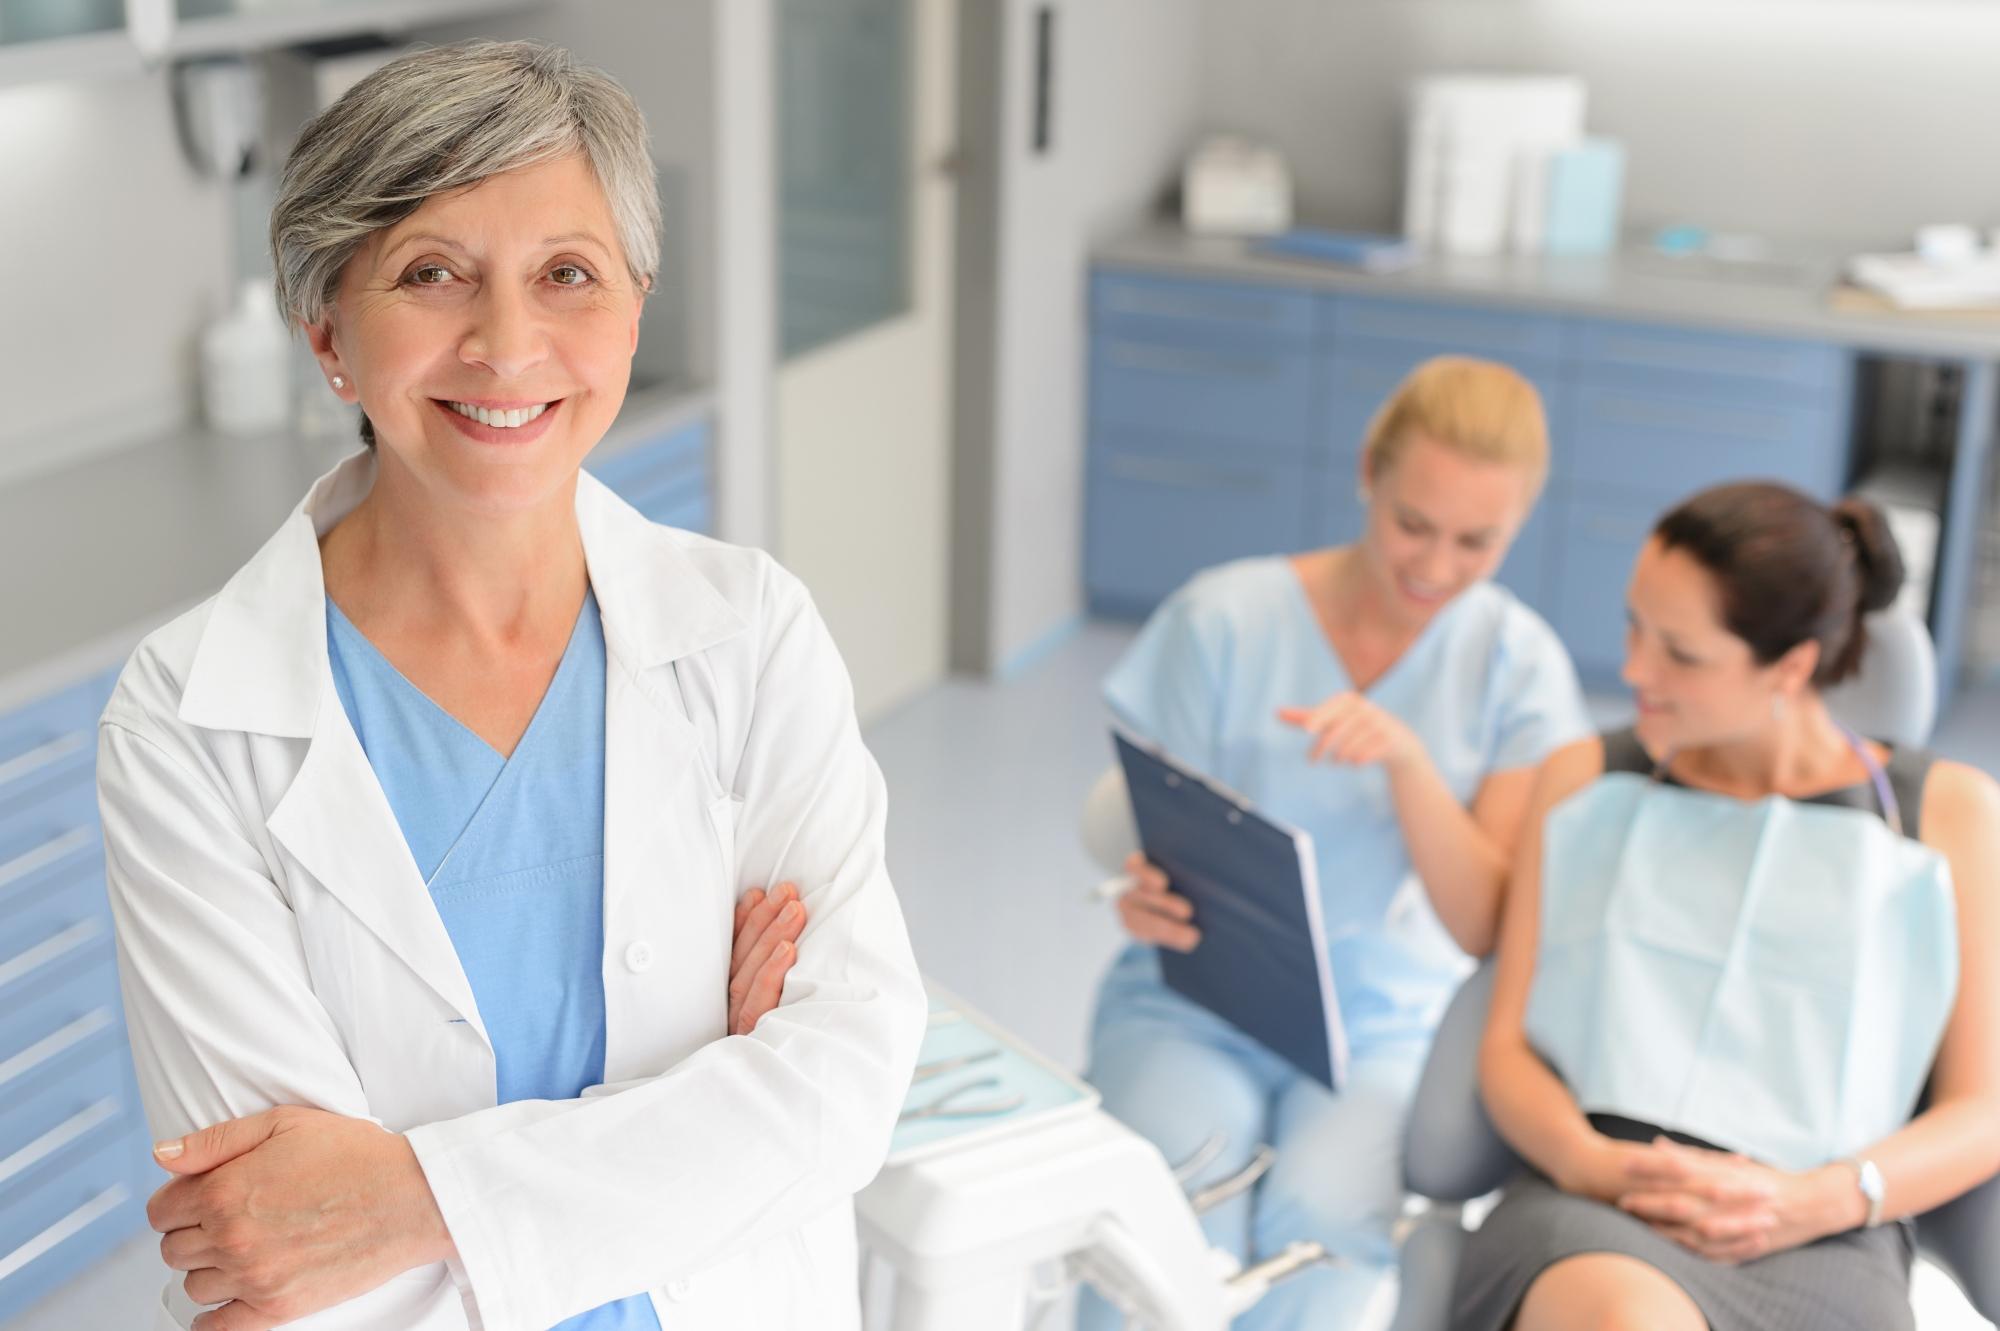 Tips for managing a dental team